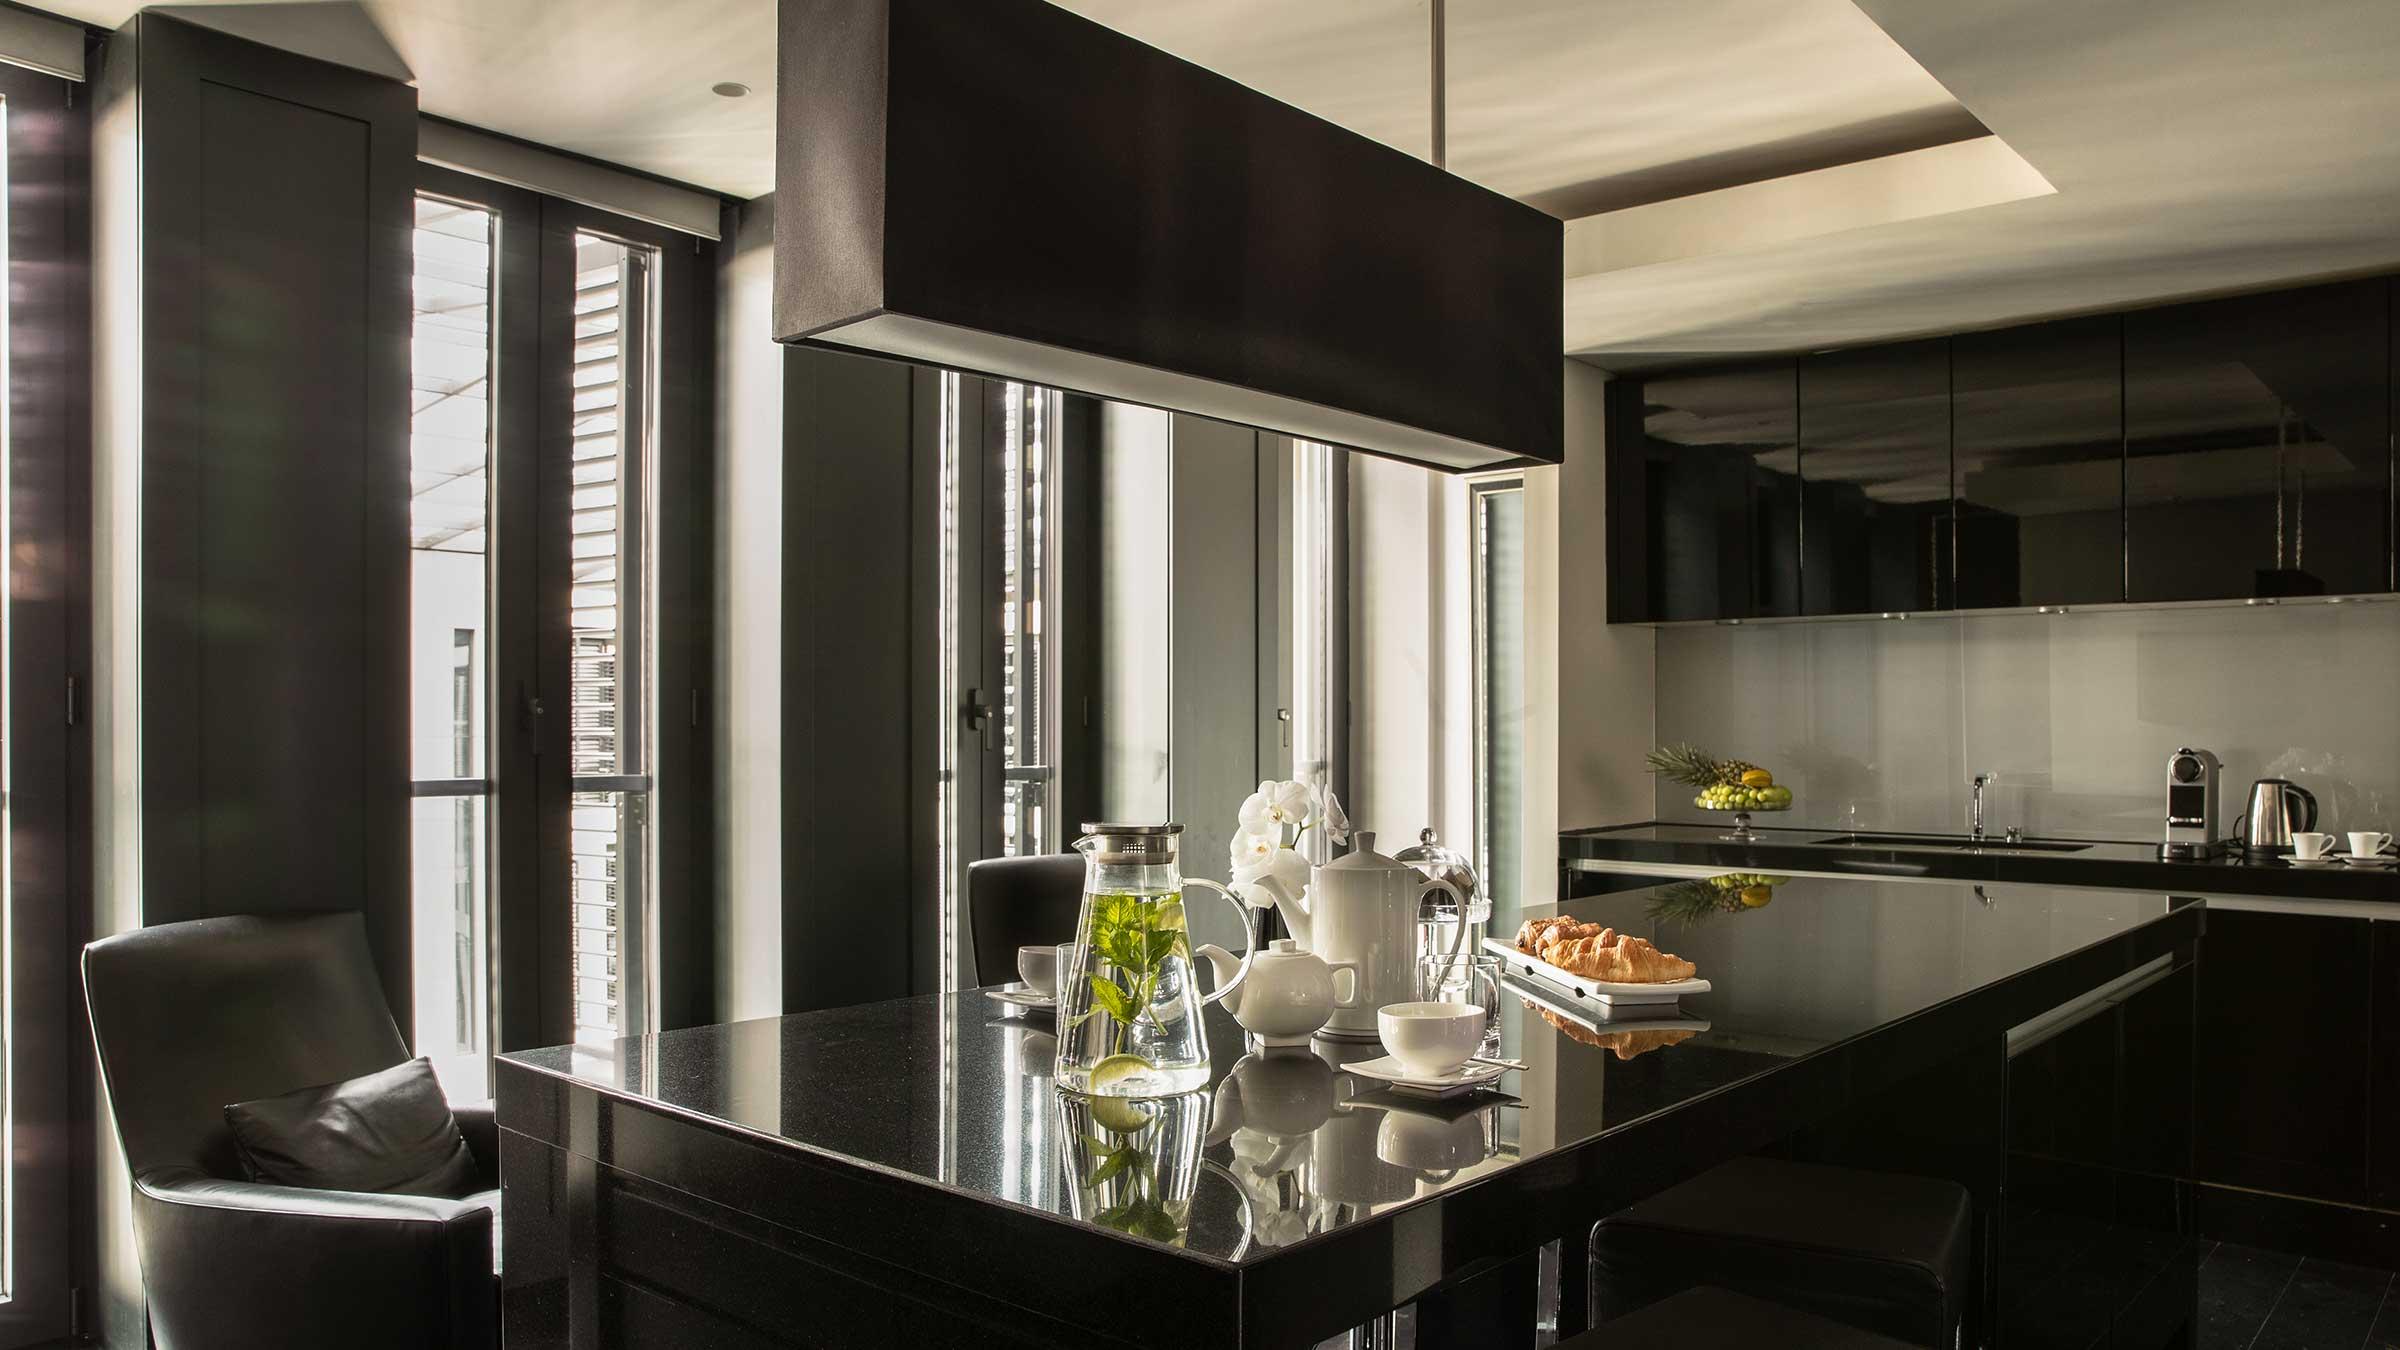 Kitchen - knightsbridge Penthouse